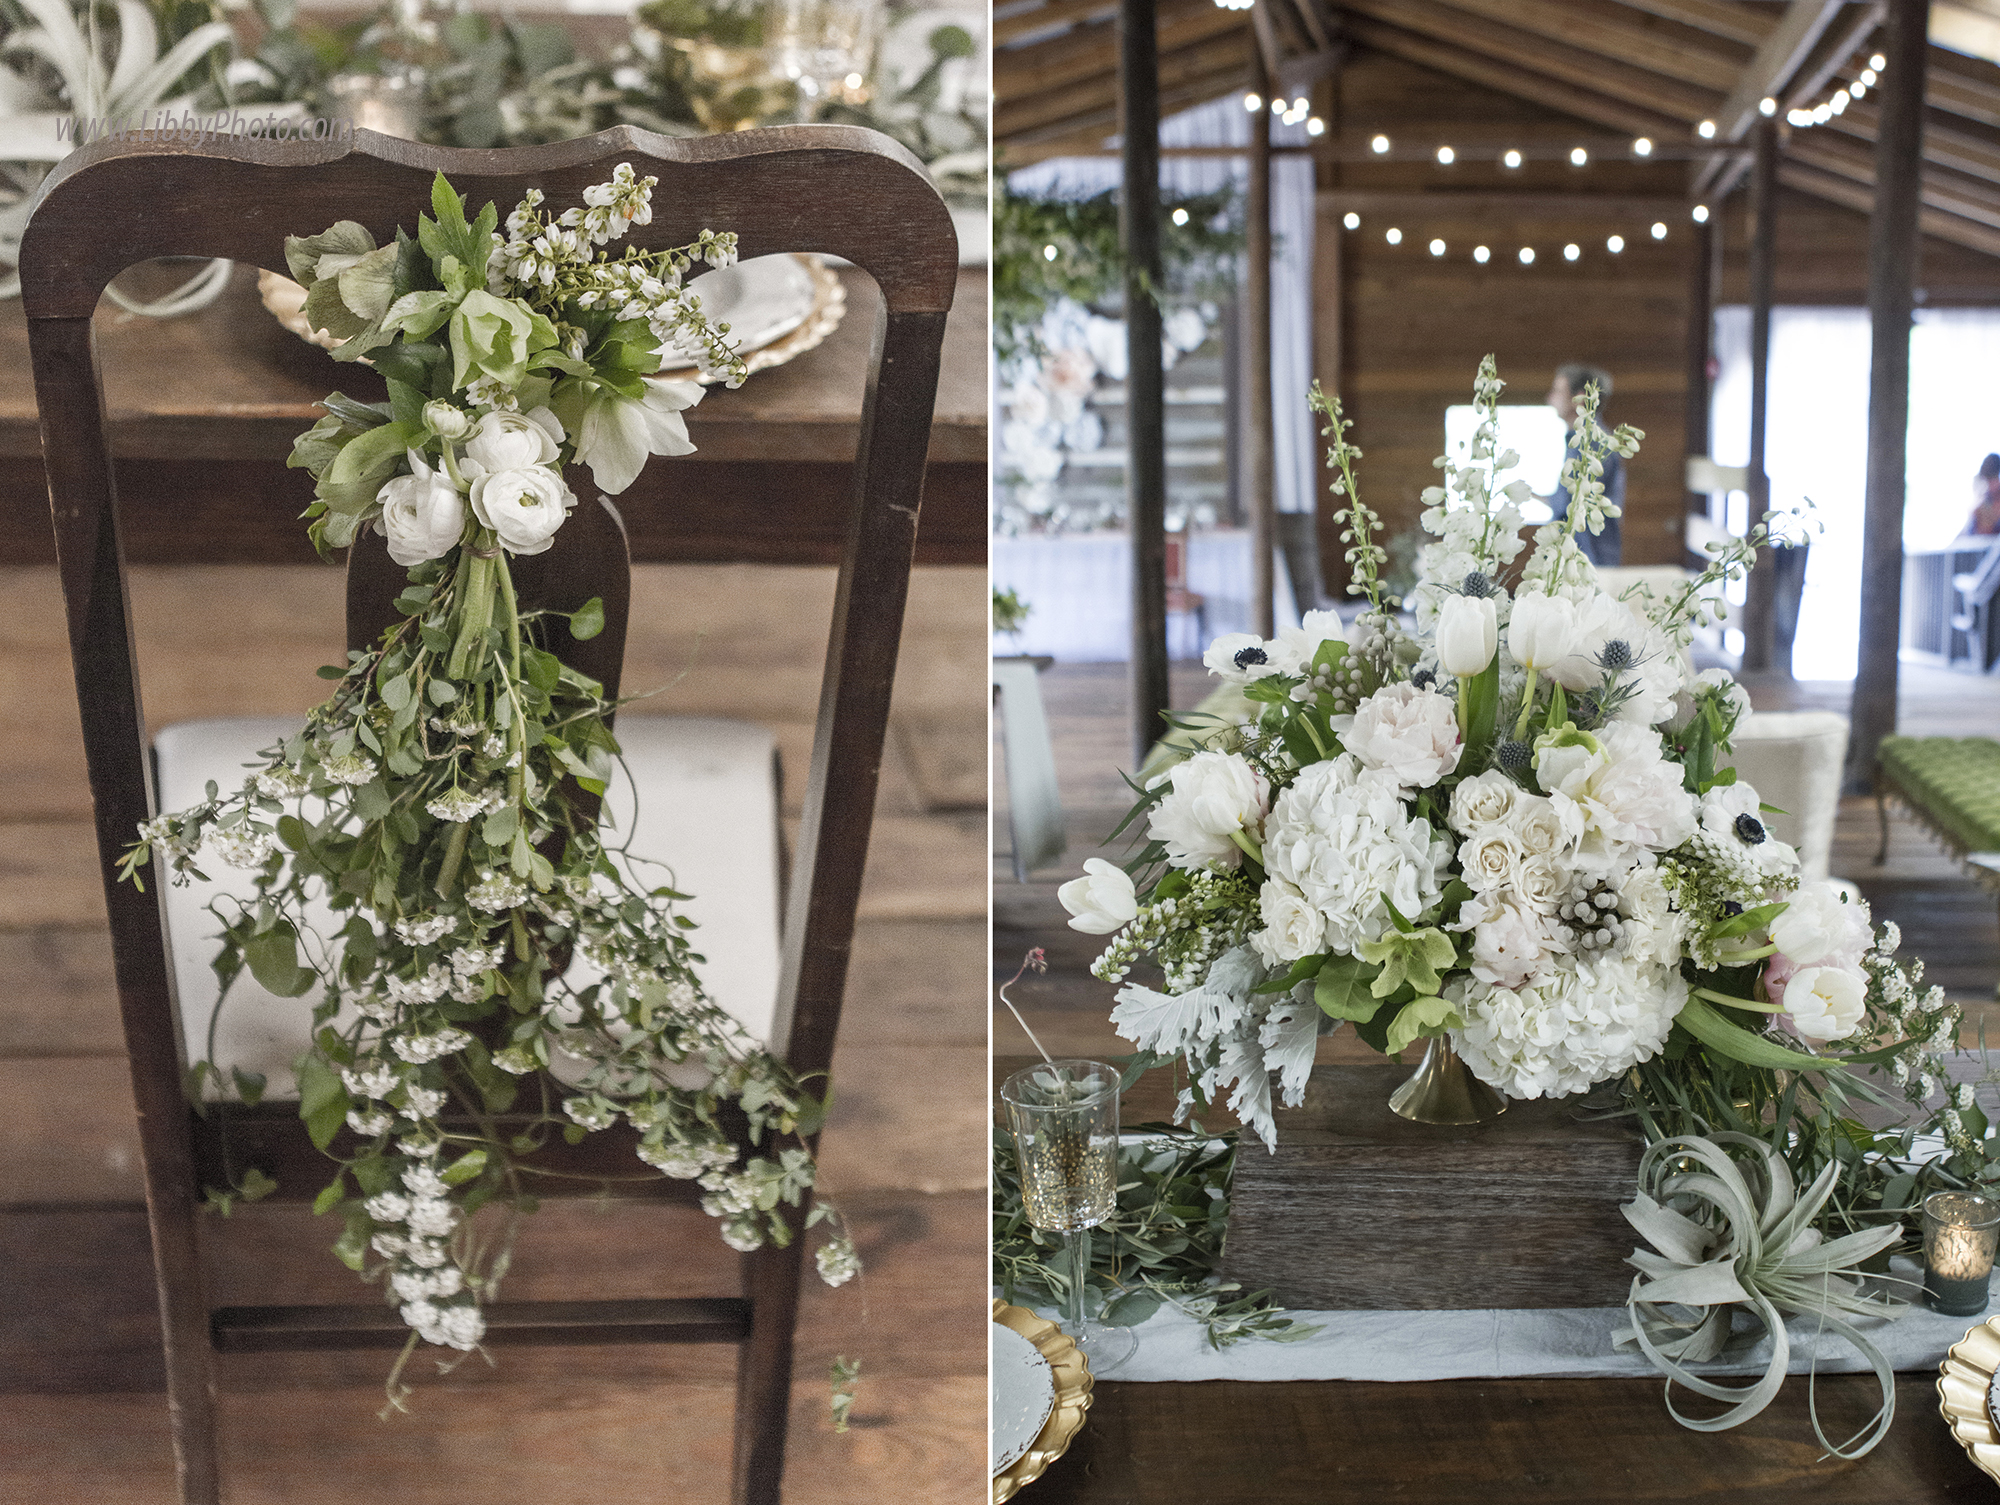 Atlanta wedding photography, Libbyphoto (32).jpg